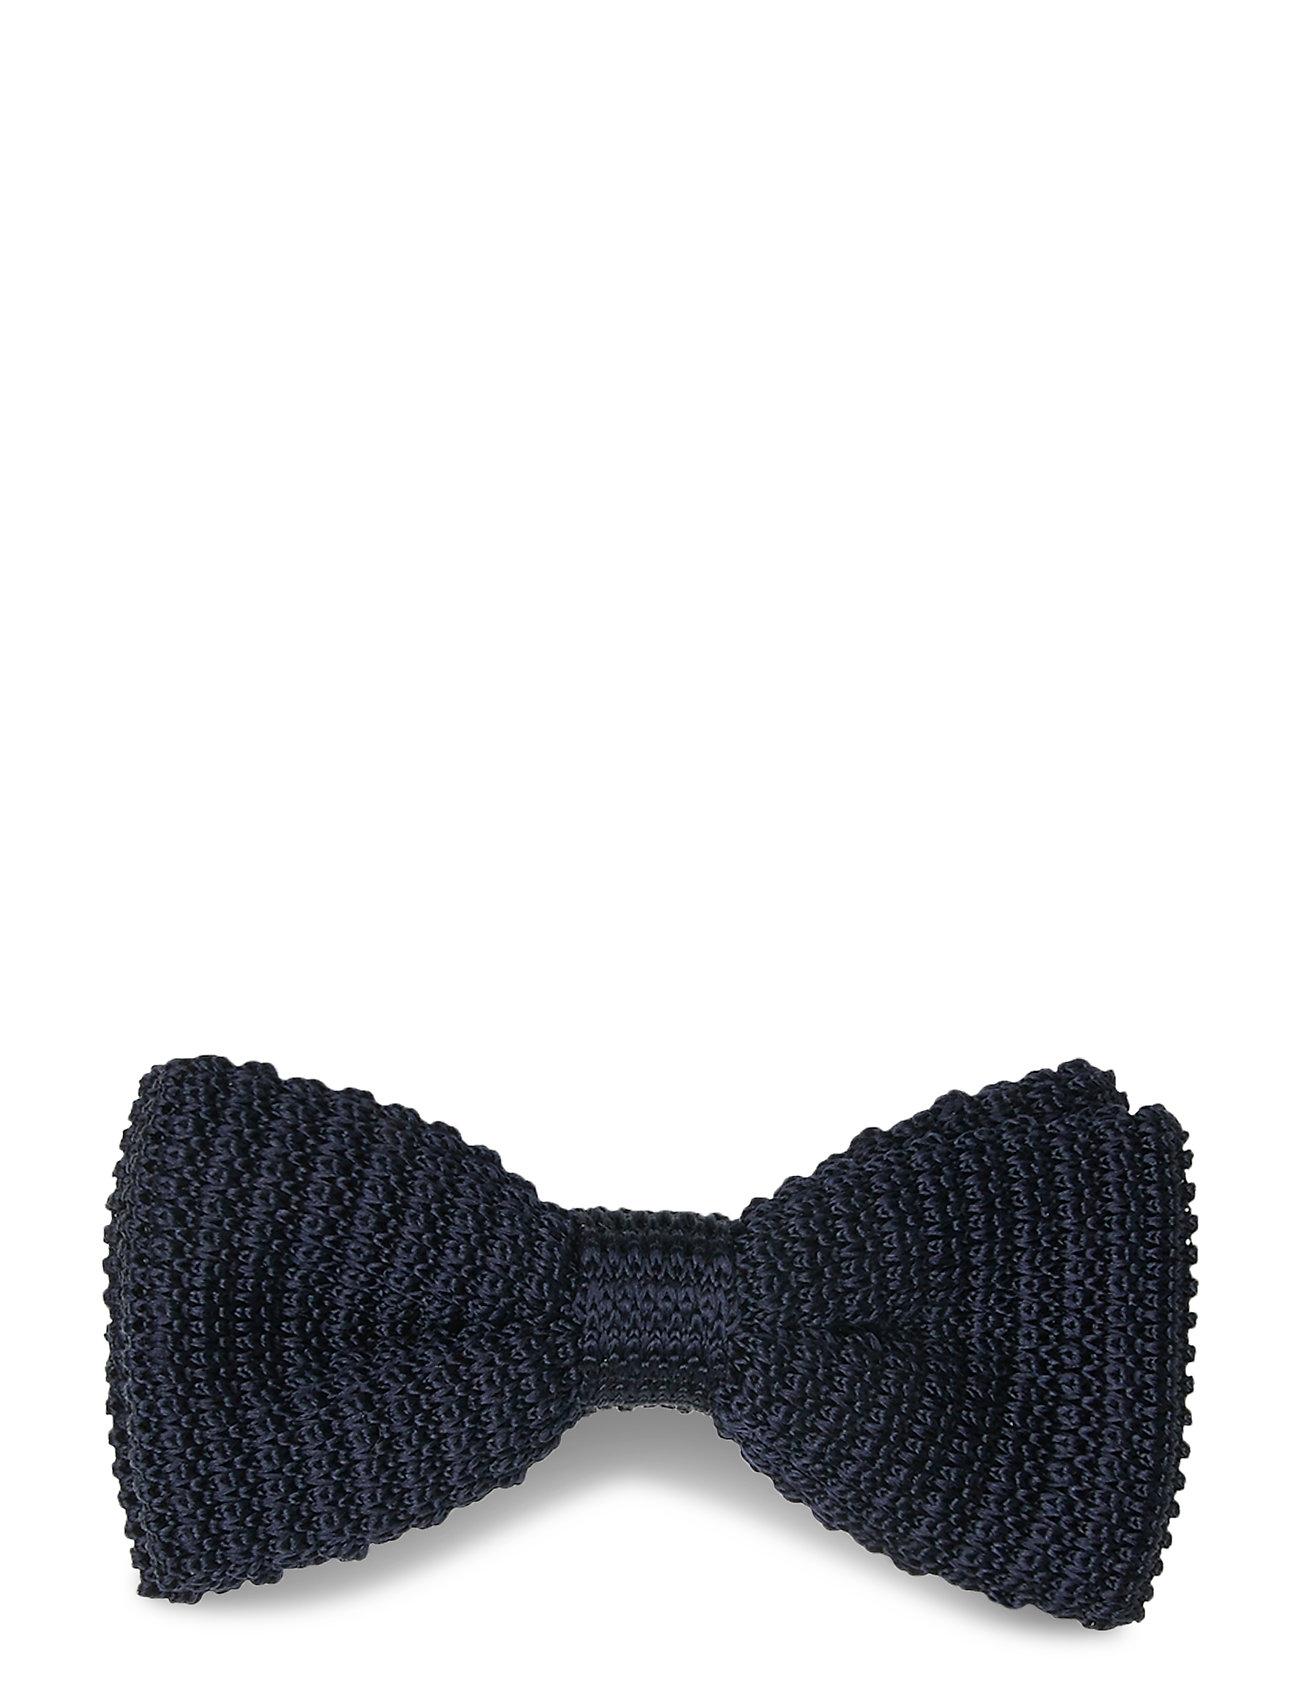 Image of Knitted Bow Tie Butterfly Blå Amanda Christensen (3474794127)